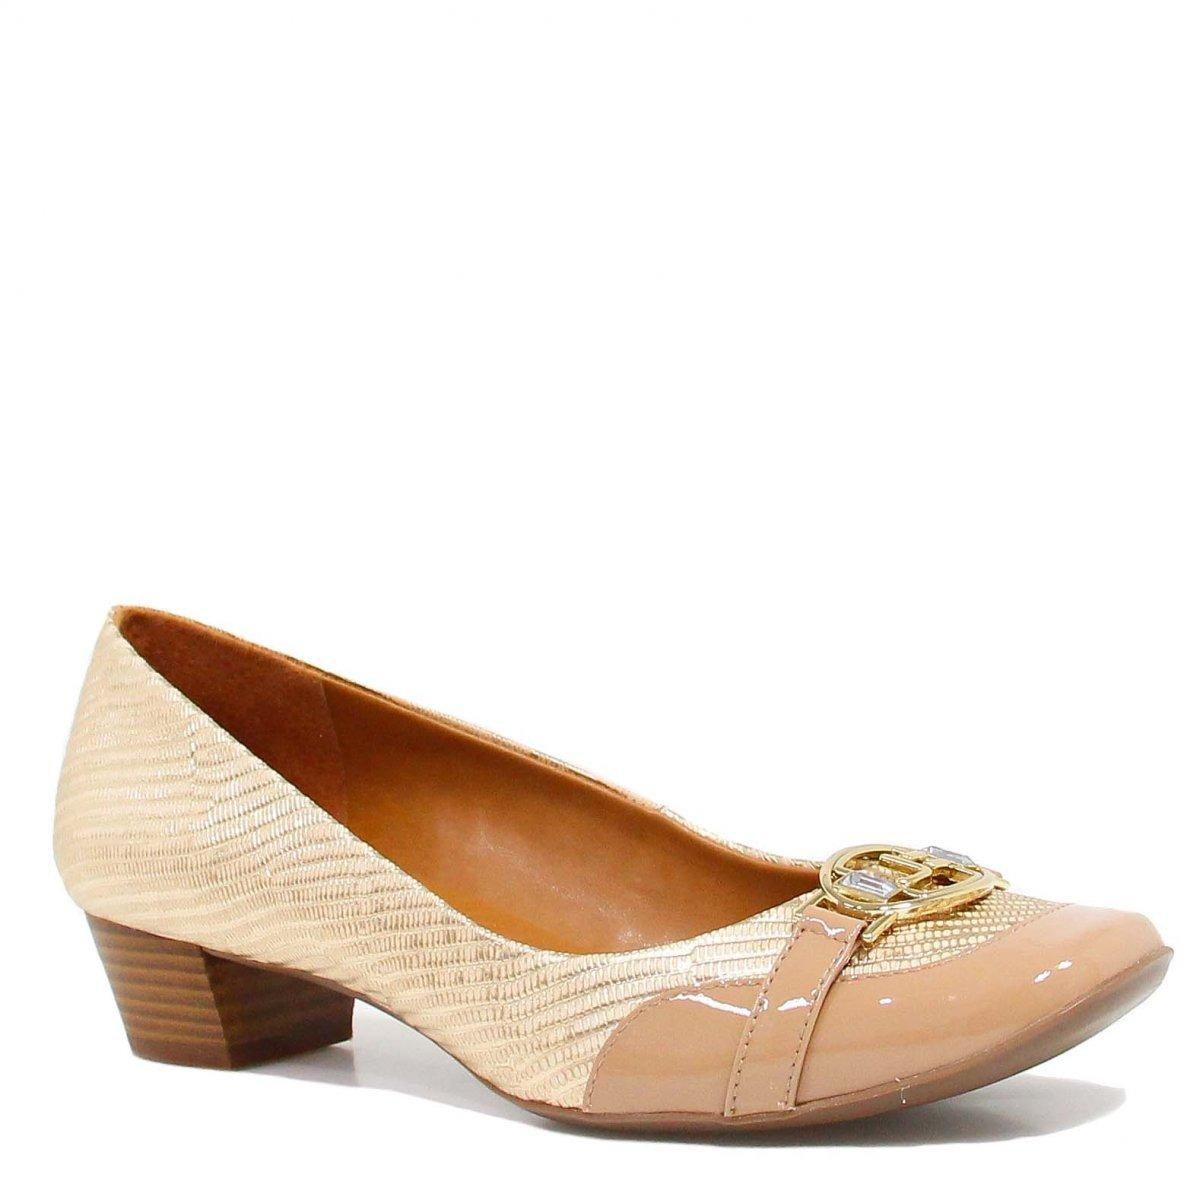 4c6ac669d Sapato Jorge Bischoff Scarpin Croco Metal Nude